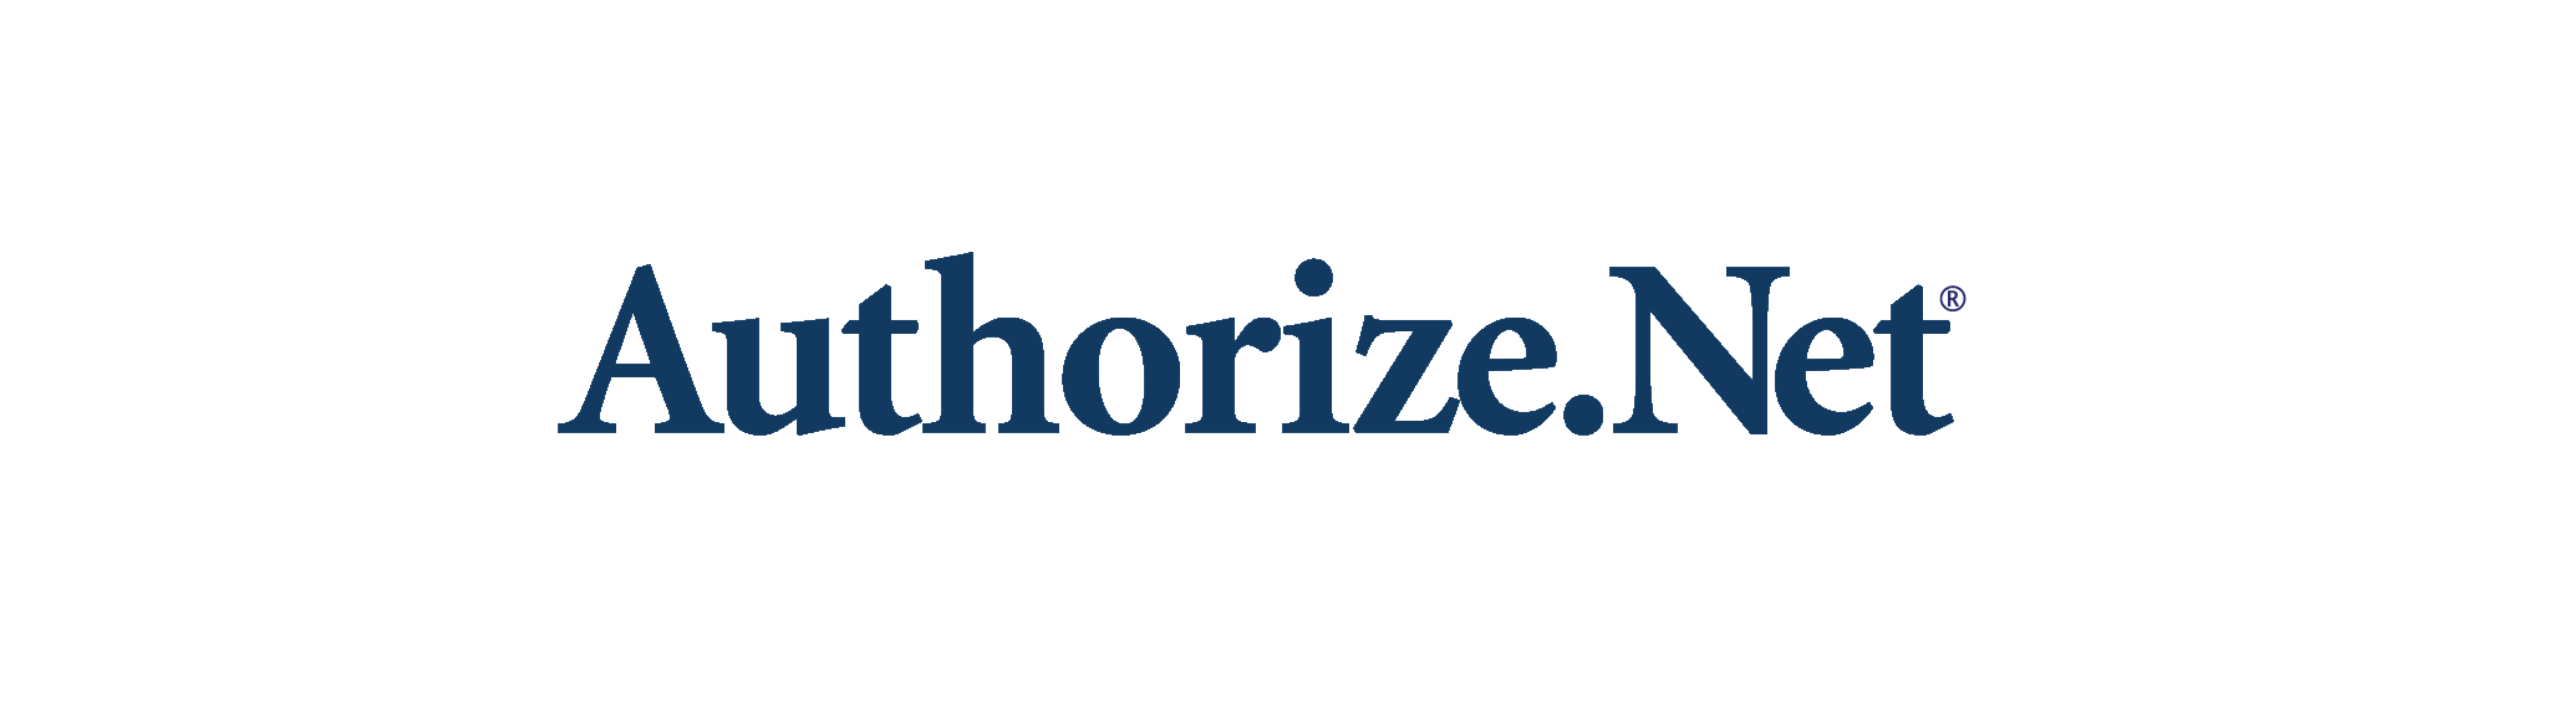 automated payment system-autorize-net